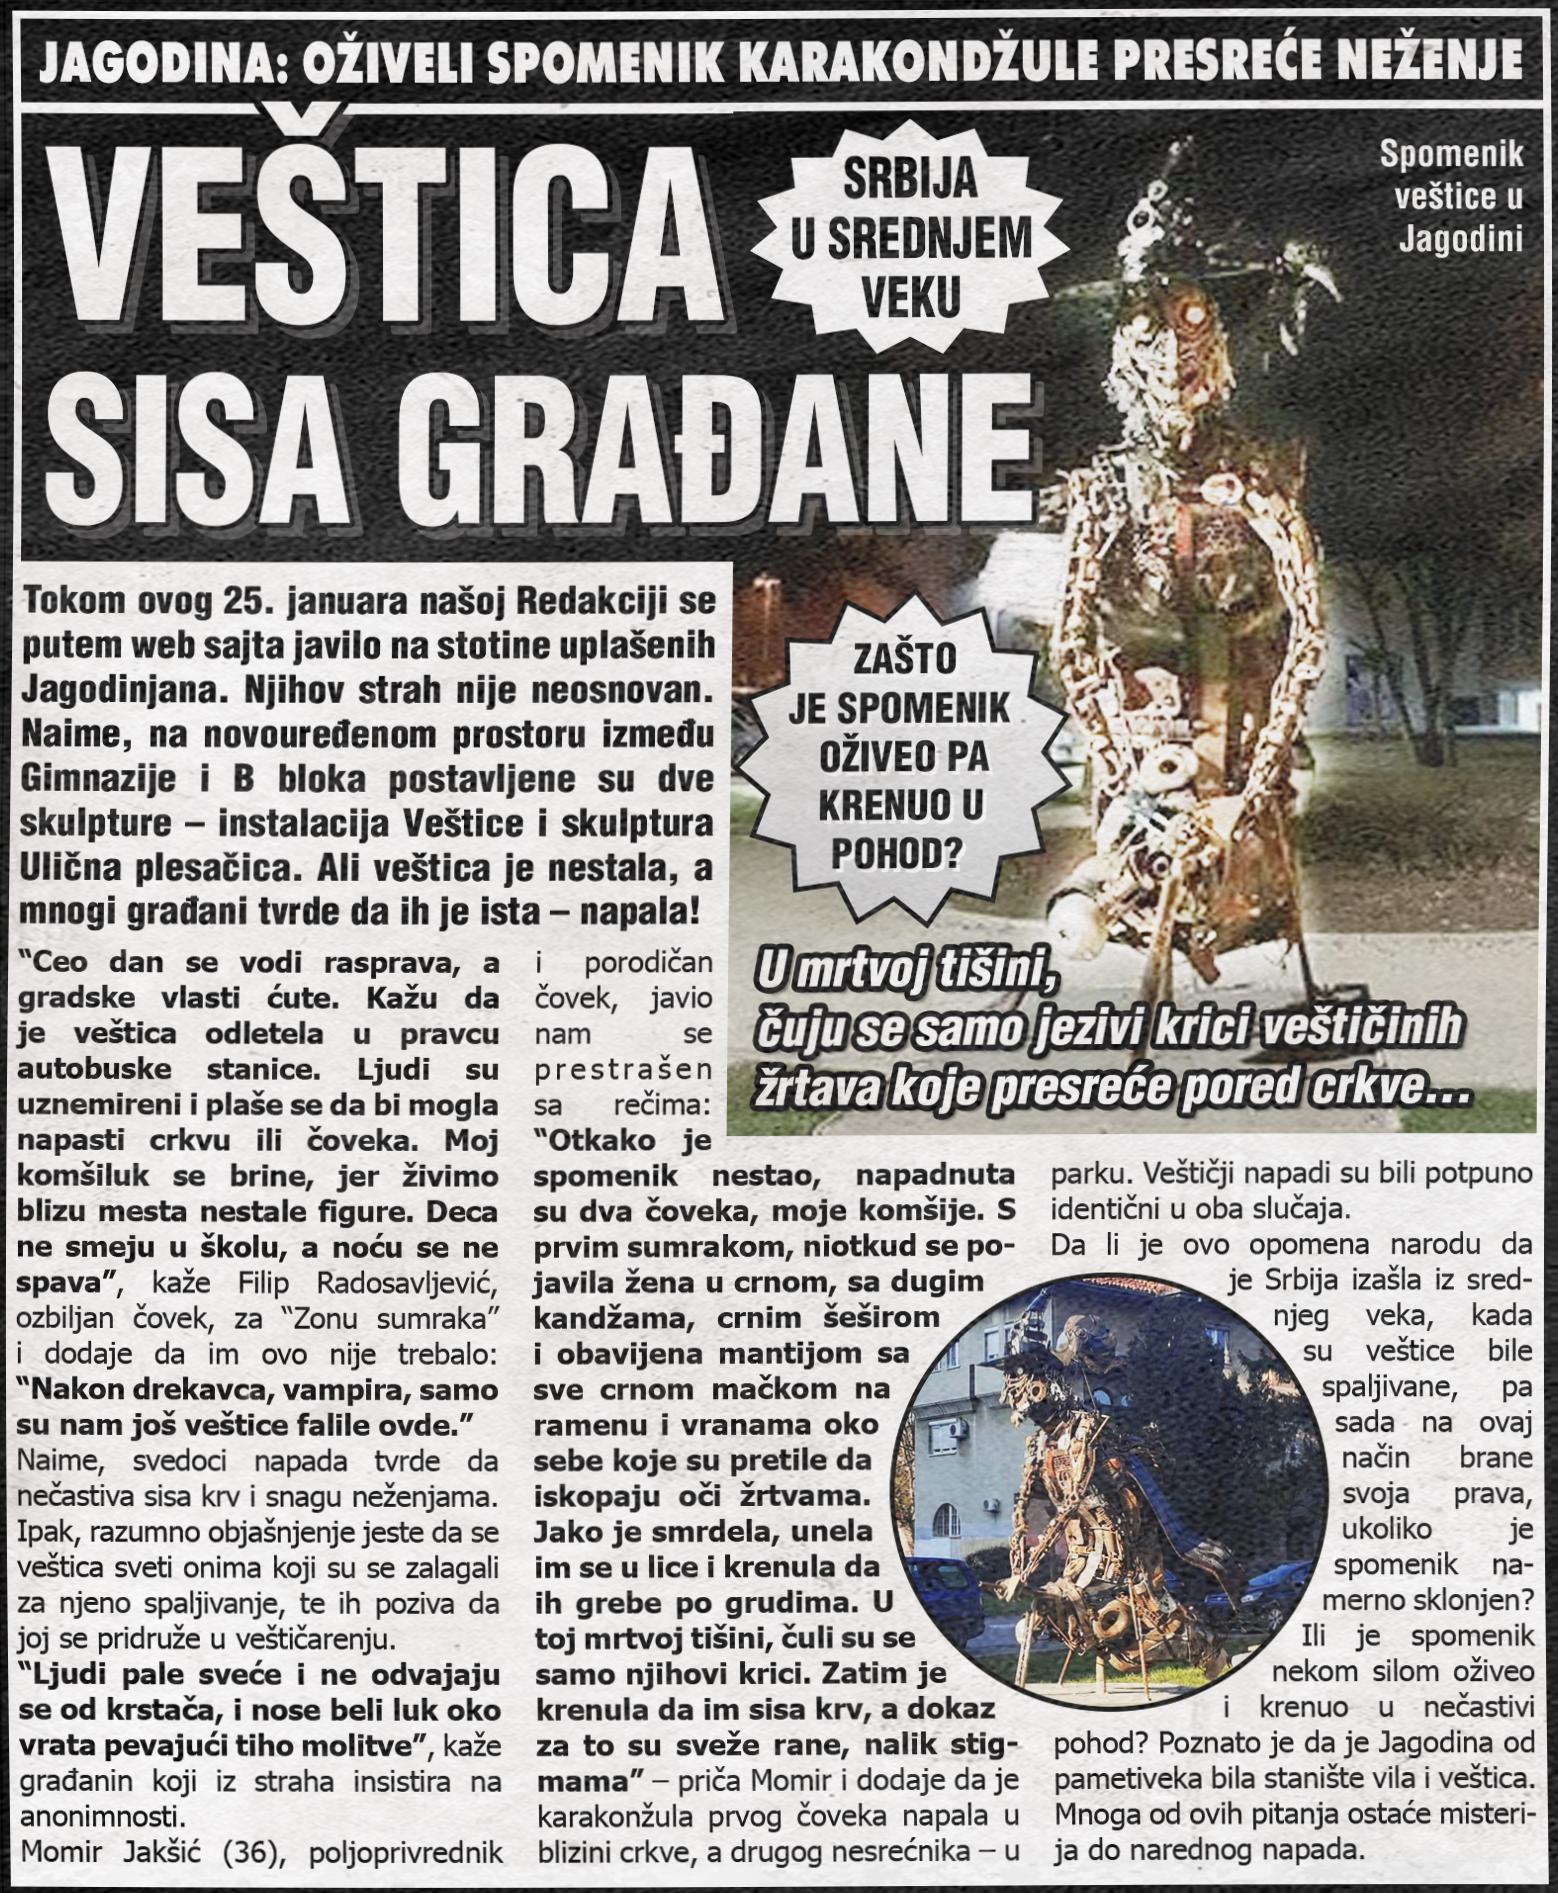 Srbija u srednjem veku: Veštica sisa građane!!!